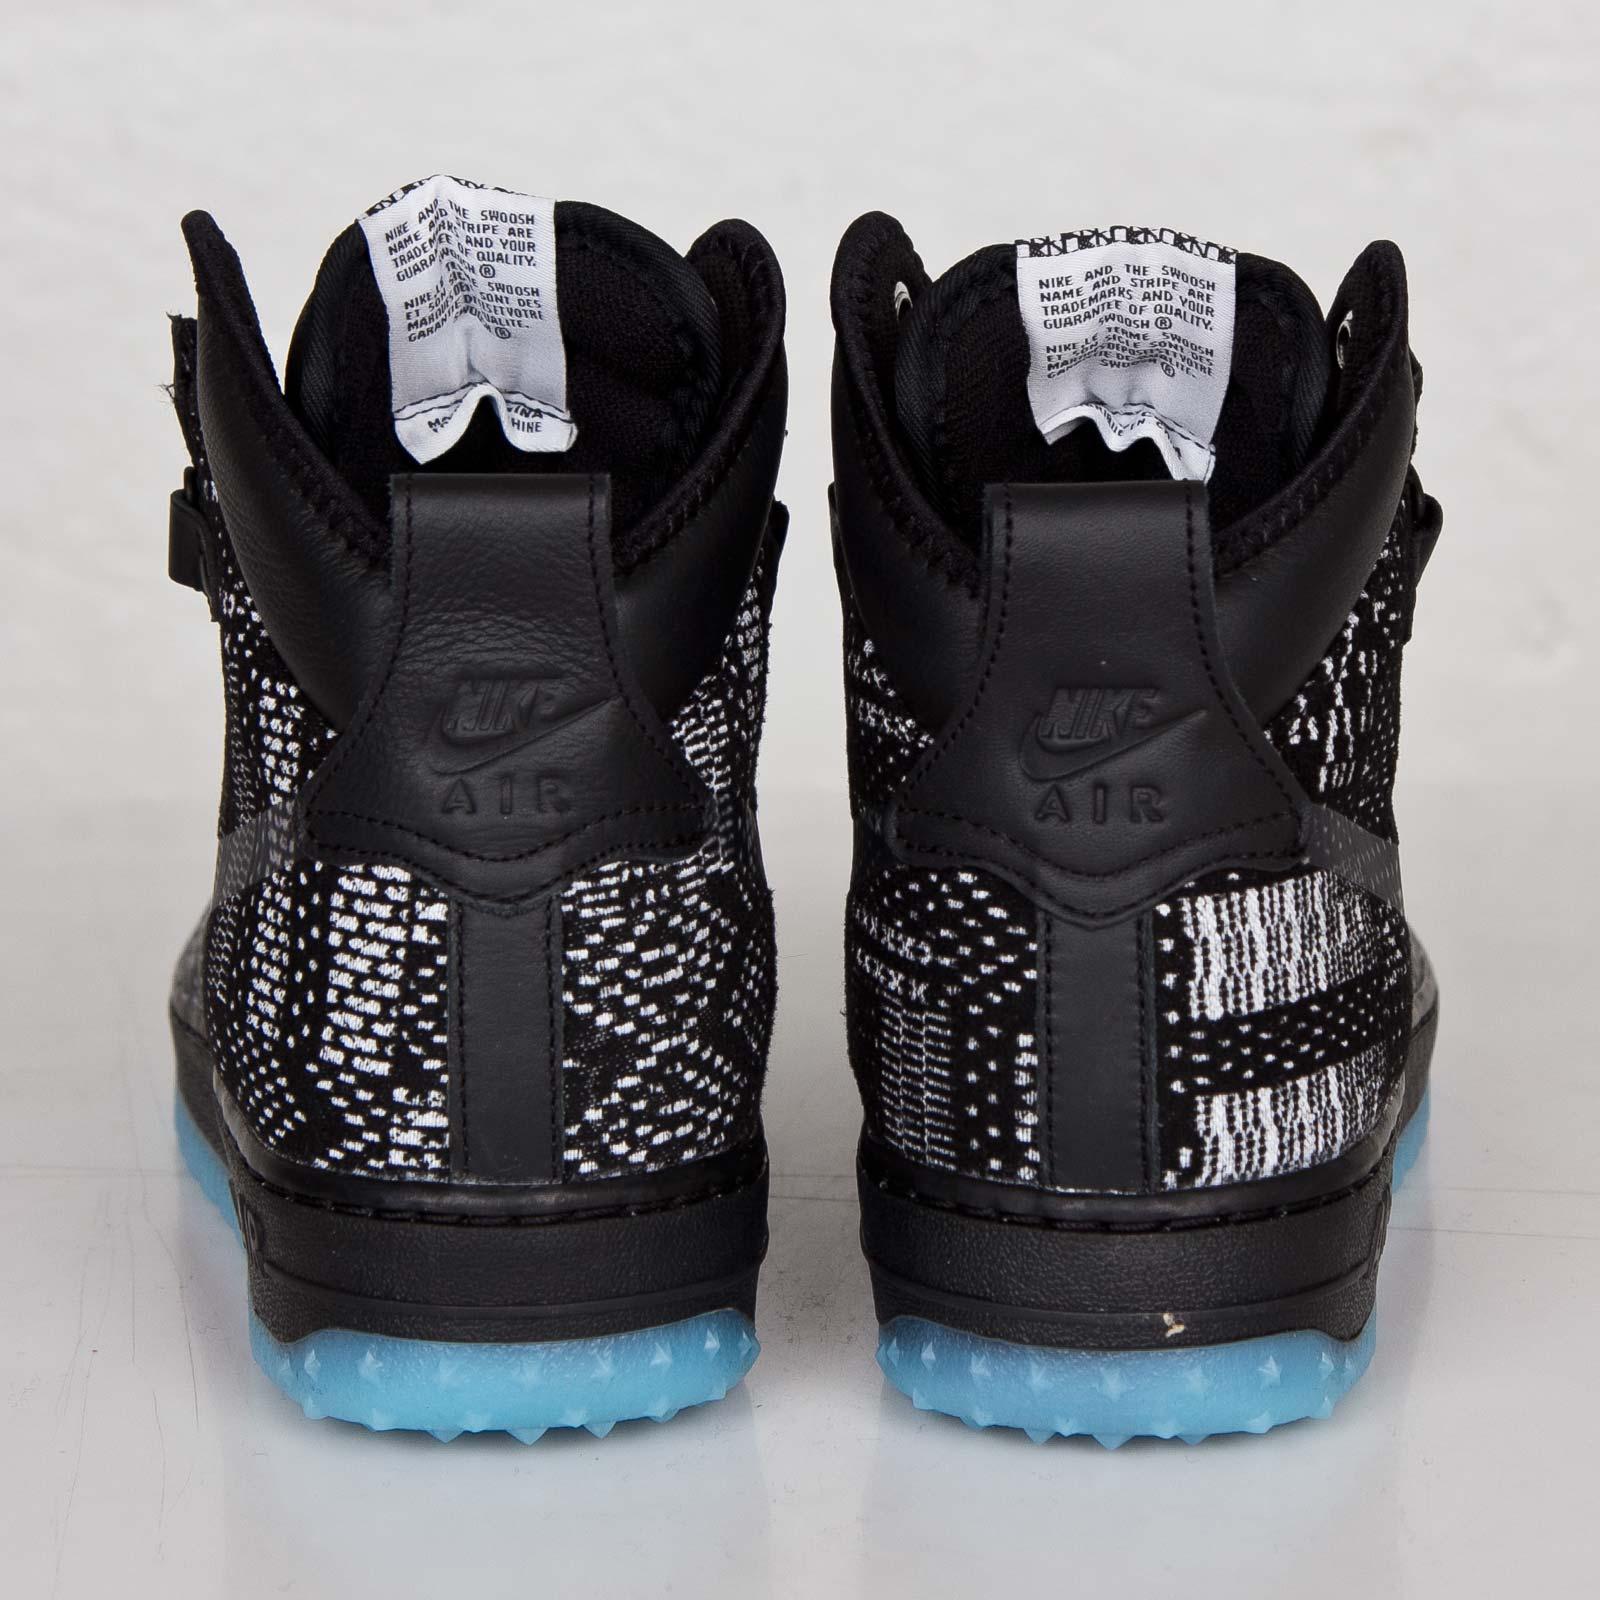 Nike Air Force 1 Duckboot BHM QS - 739390-001 - Sneakersnstuff ... 850cd7c6d3